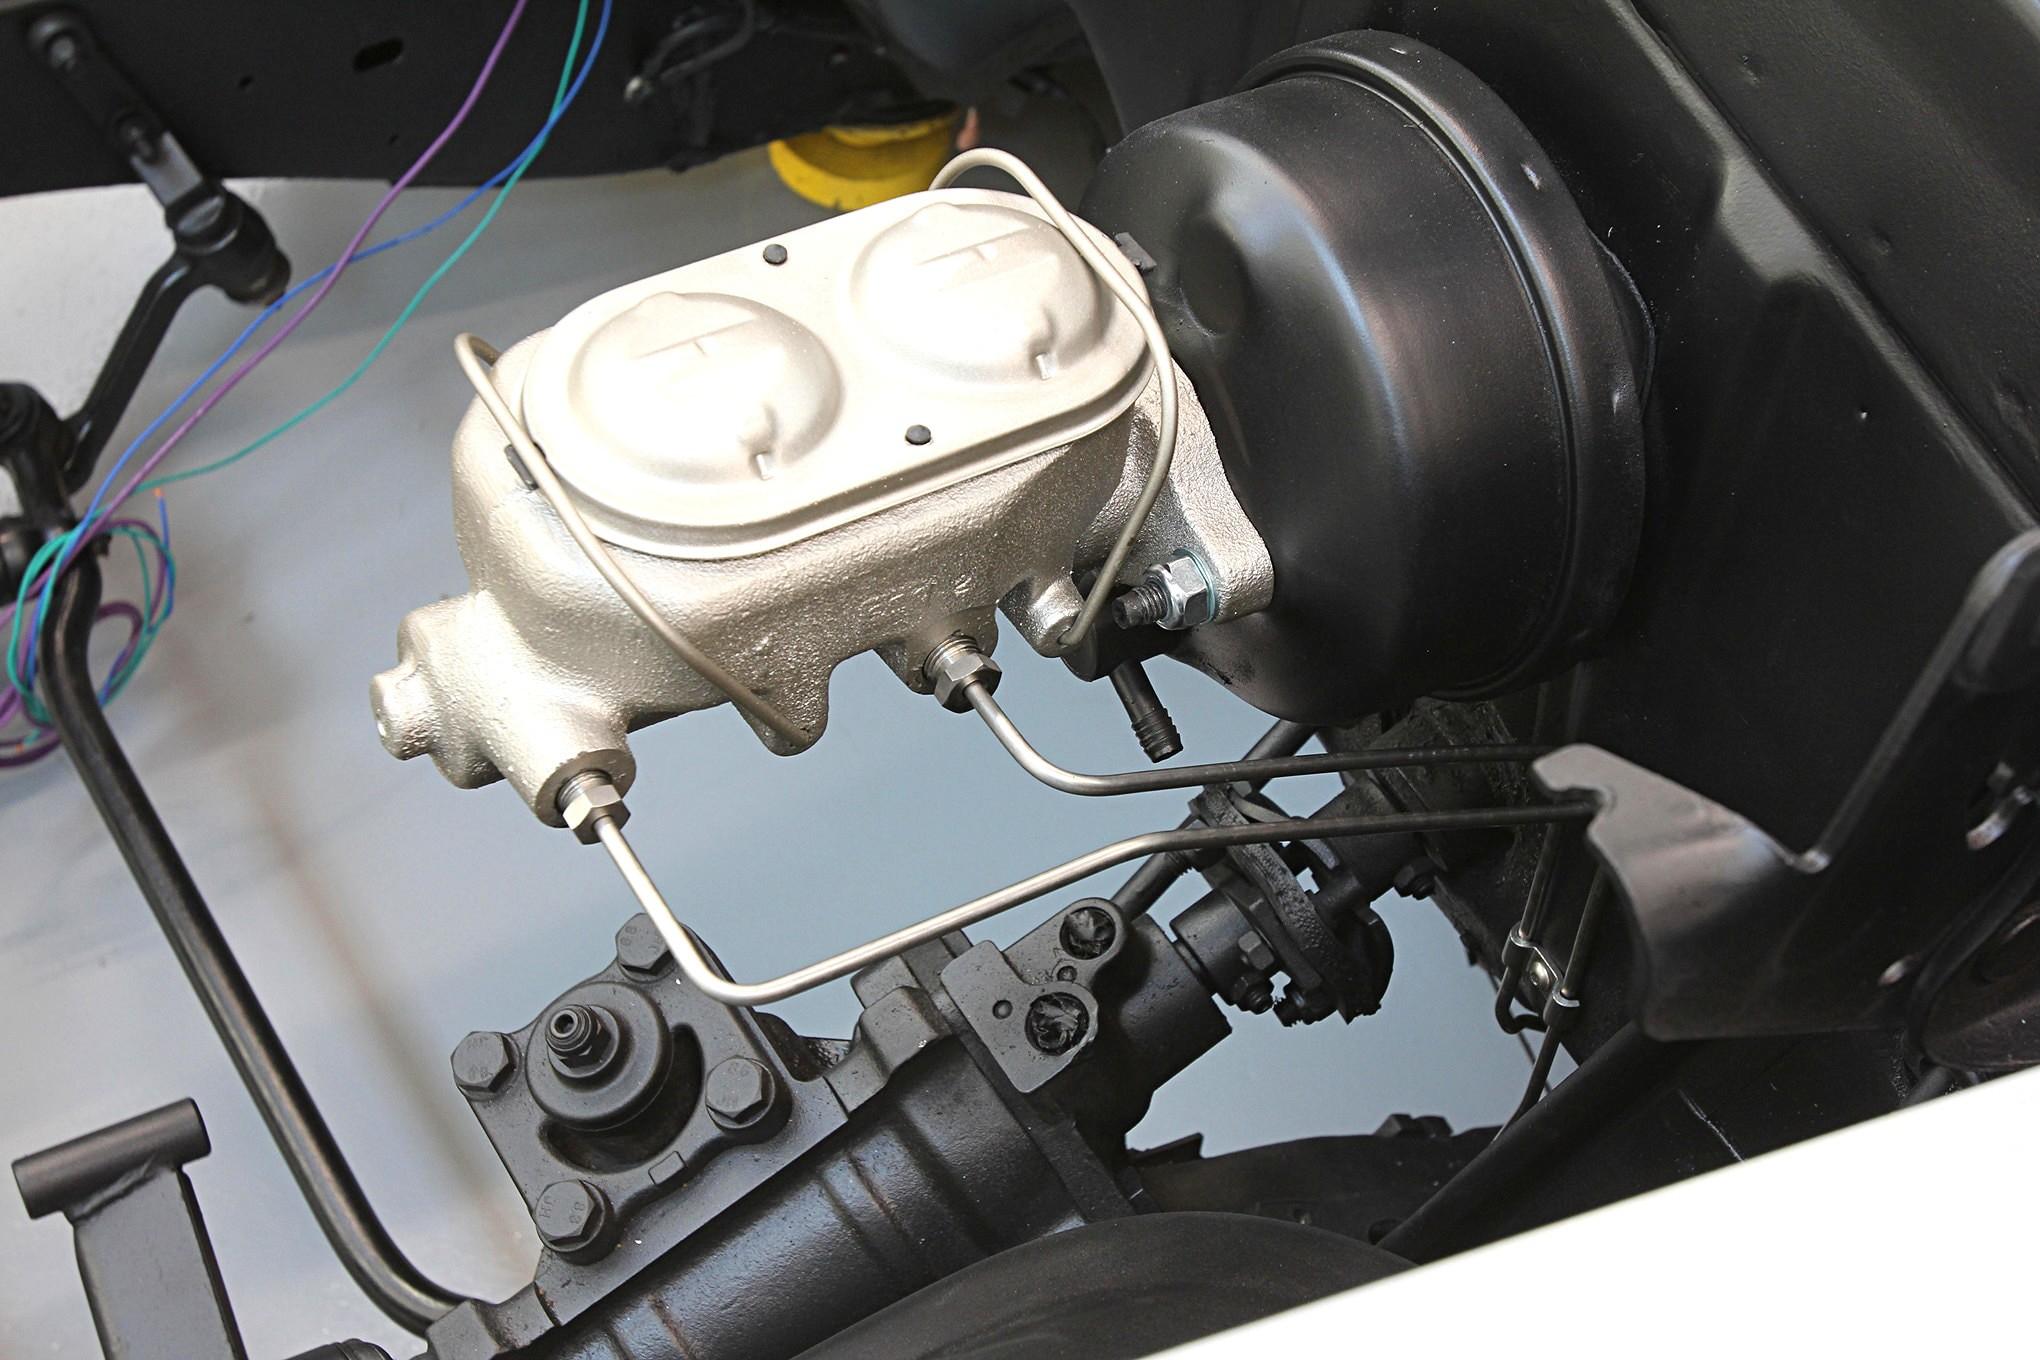 Automotive Brake System Diagram Proper Plumbing Pointers Making and Installing Brake Lines Hot Of Automotive Brake System Diagram